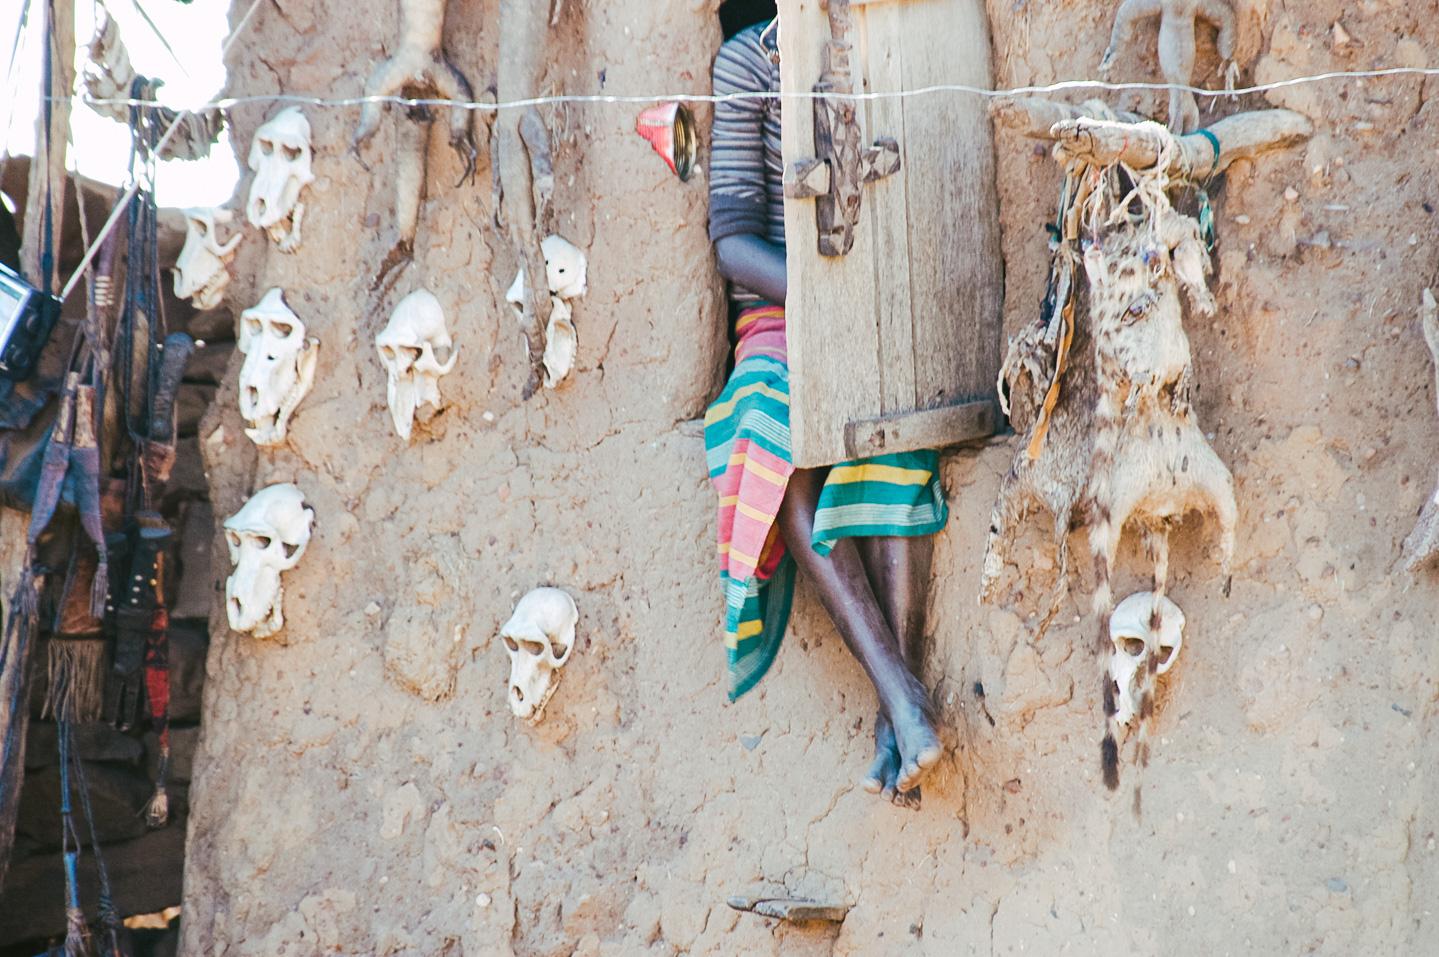 Rund um Afrika - Mali - Westafrika - Transafrika-459